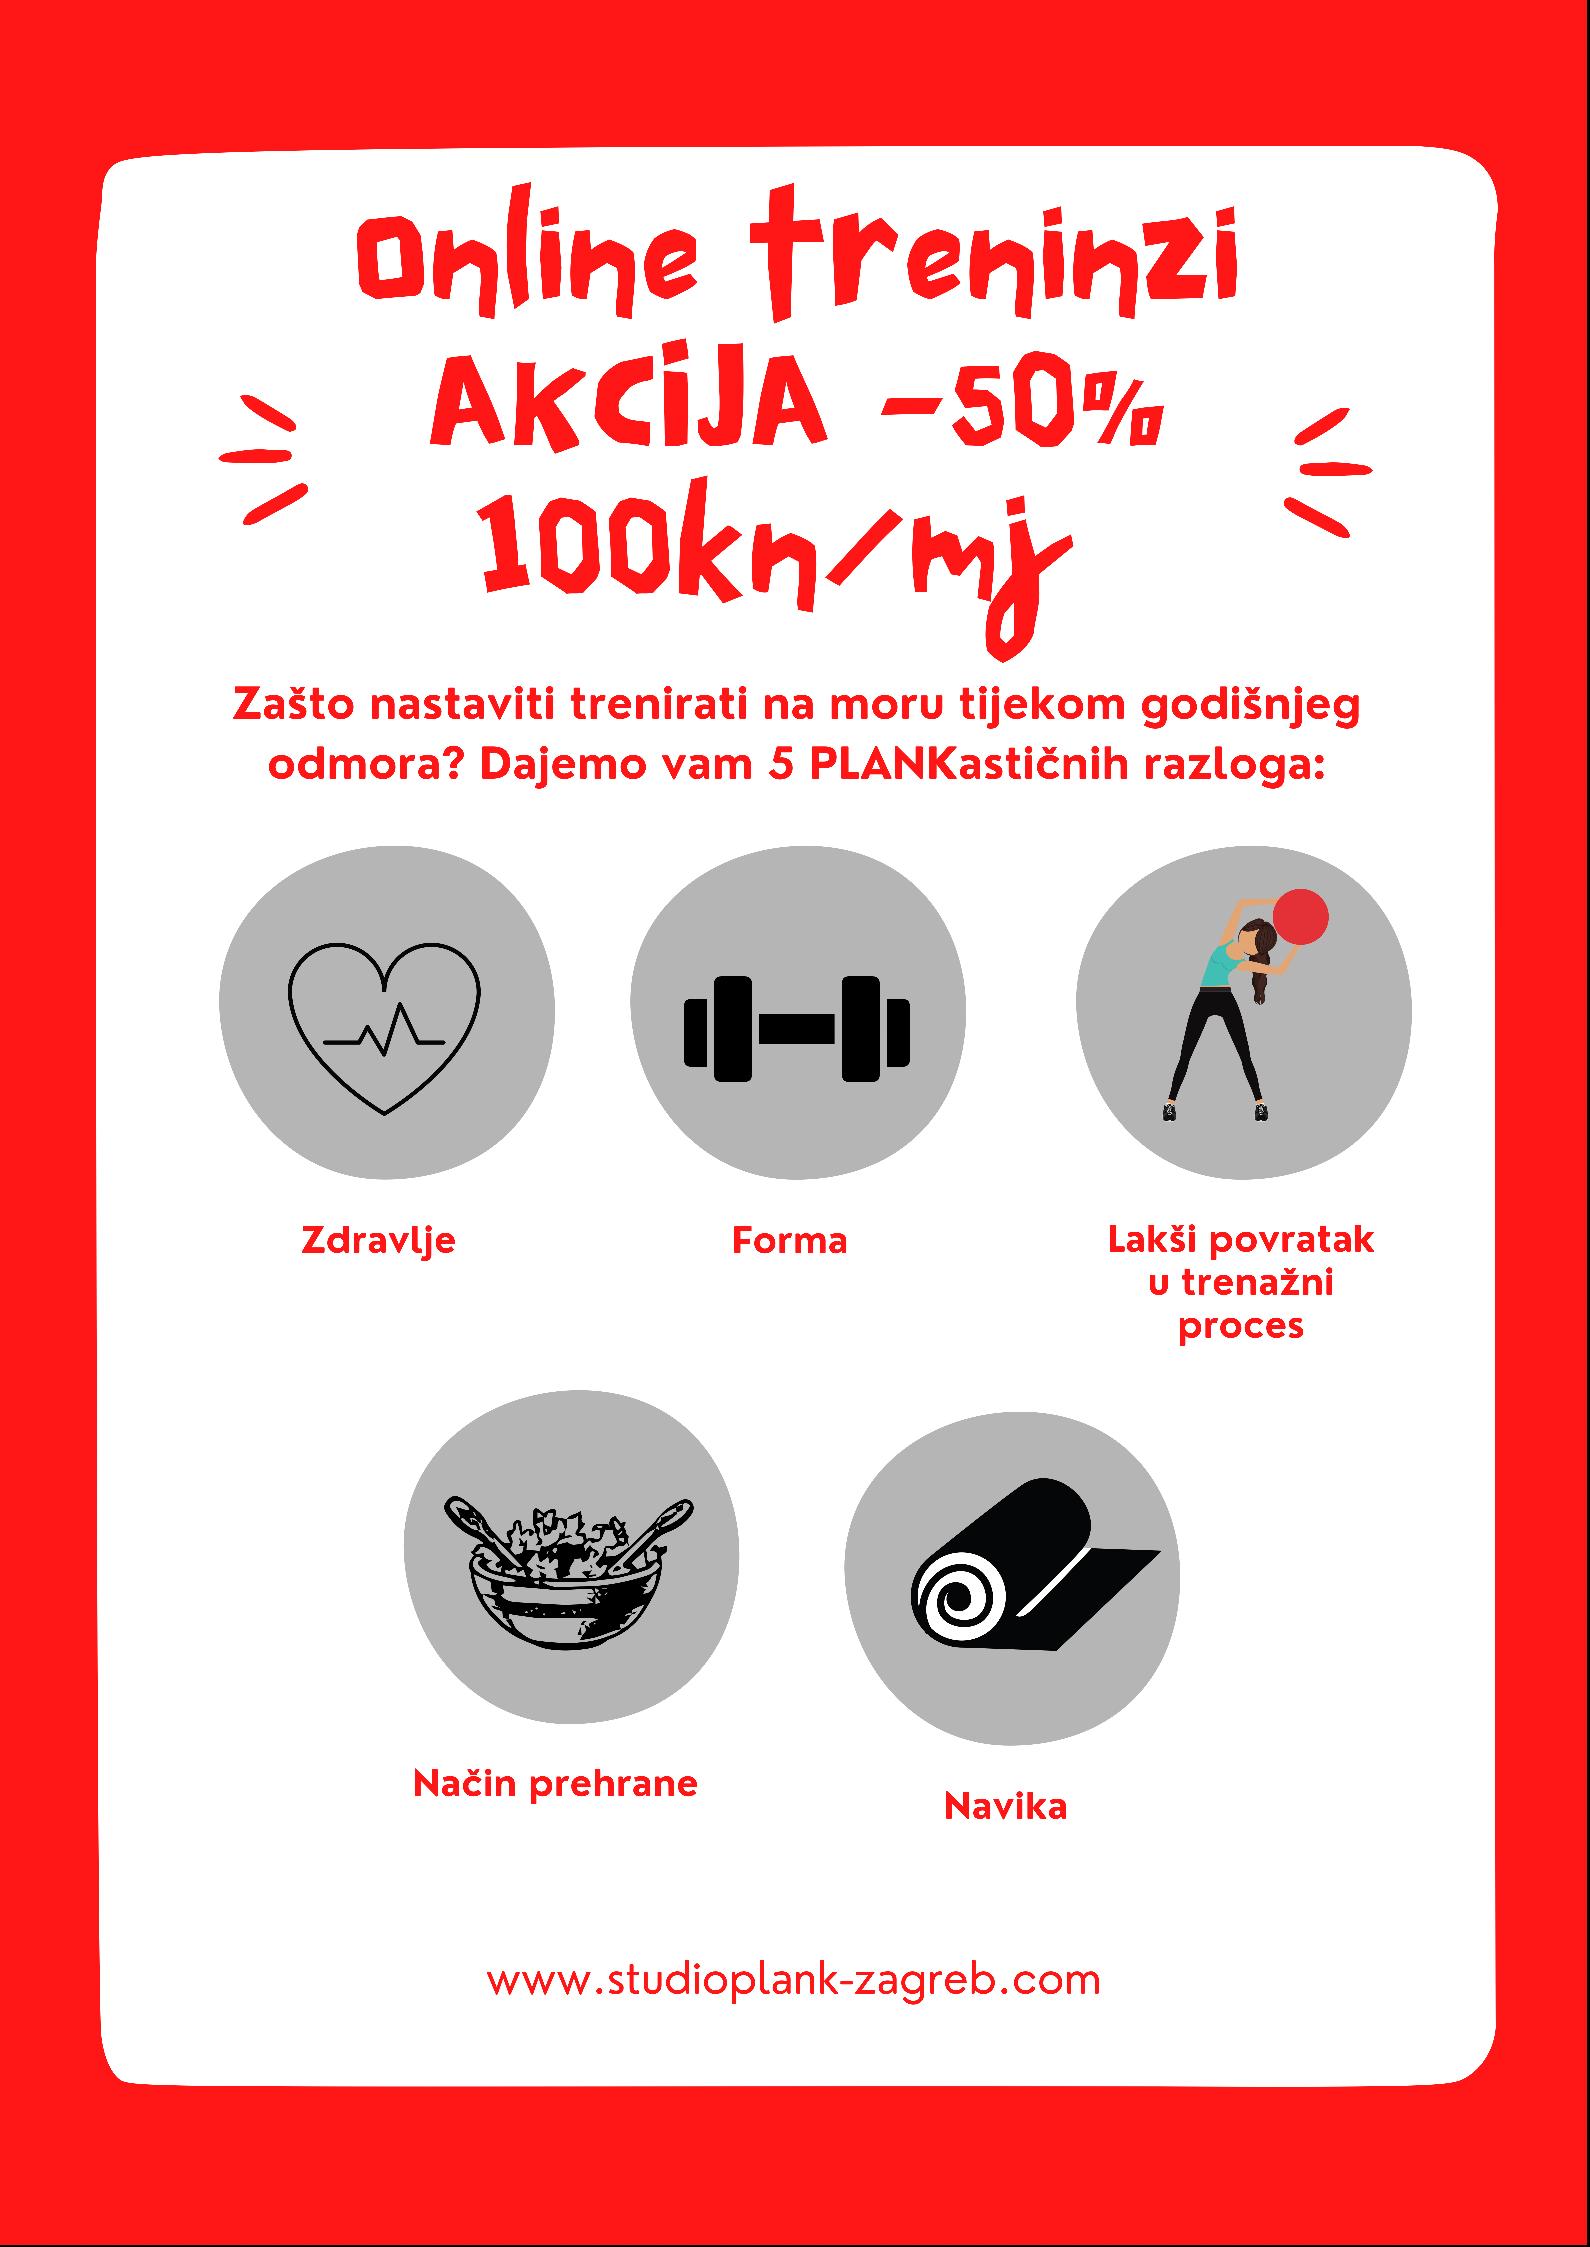 AKCIJA -50%